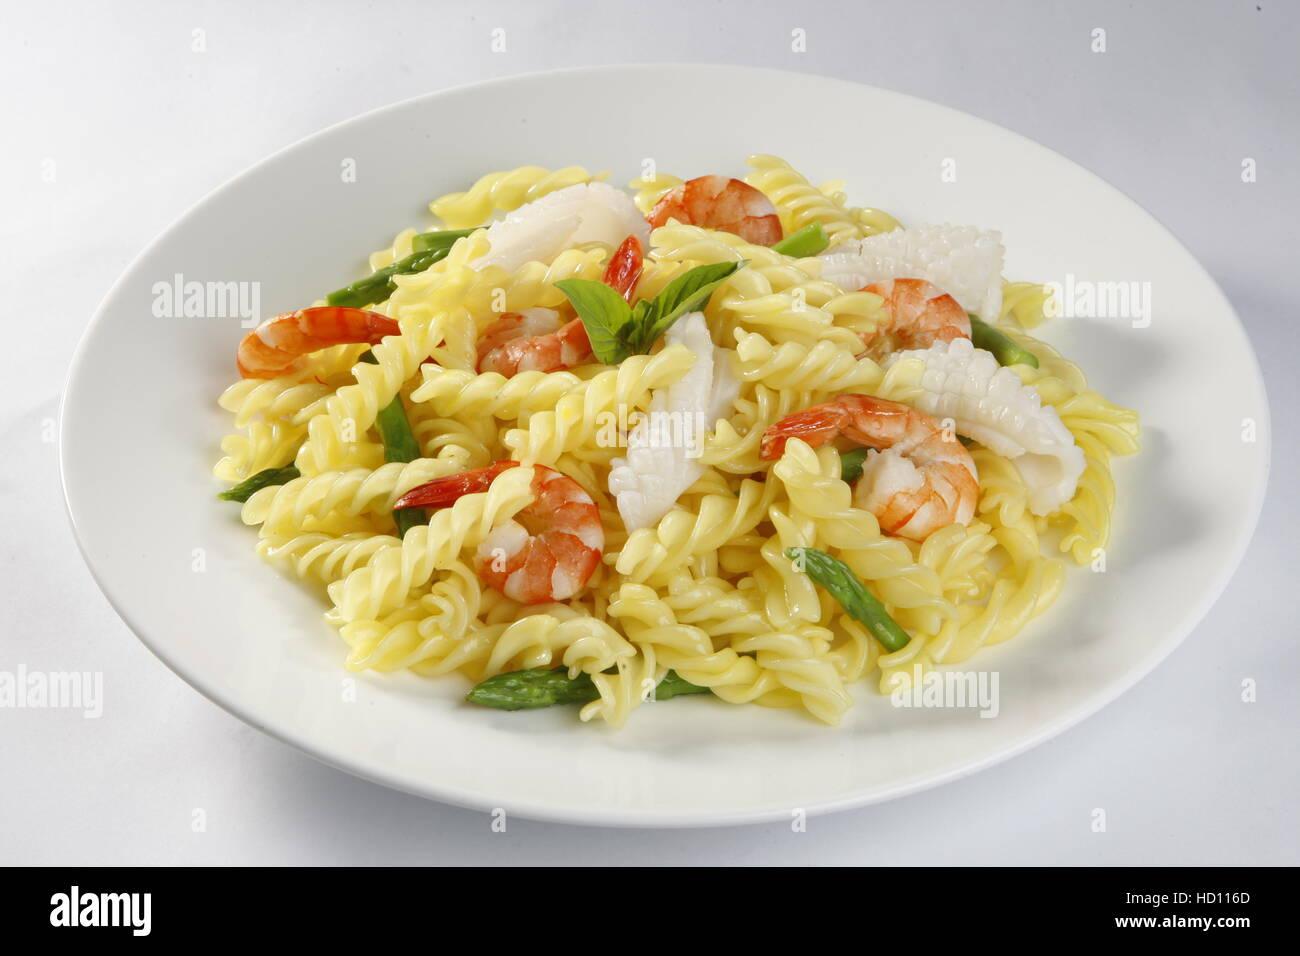 Macaroni noodles - Stock Image